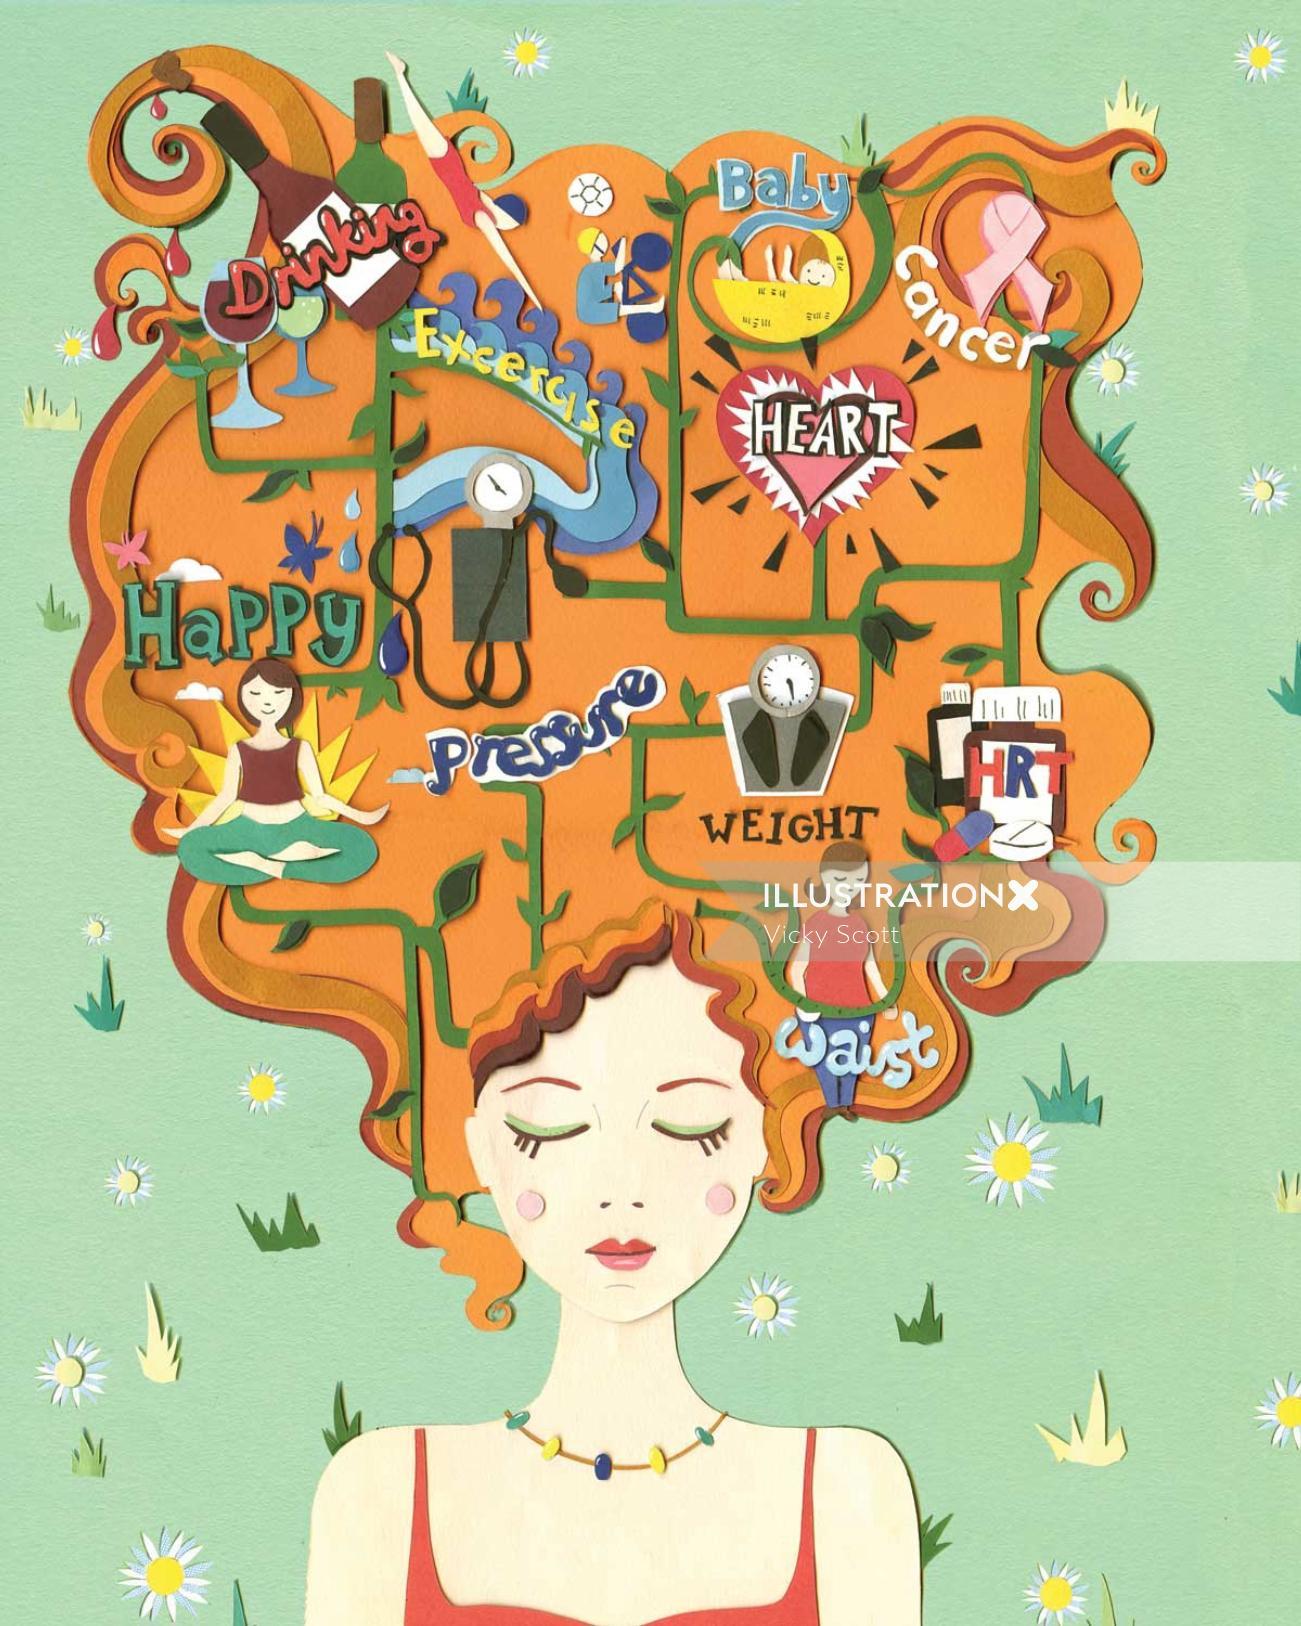 health, lady, hair, flowers, daisy, baby, wine, leaves